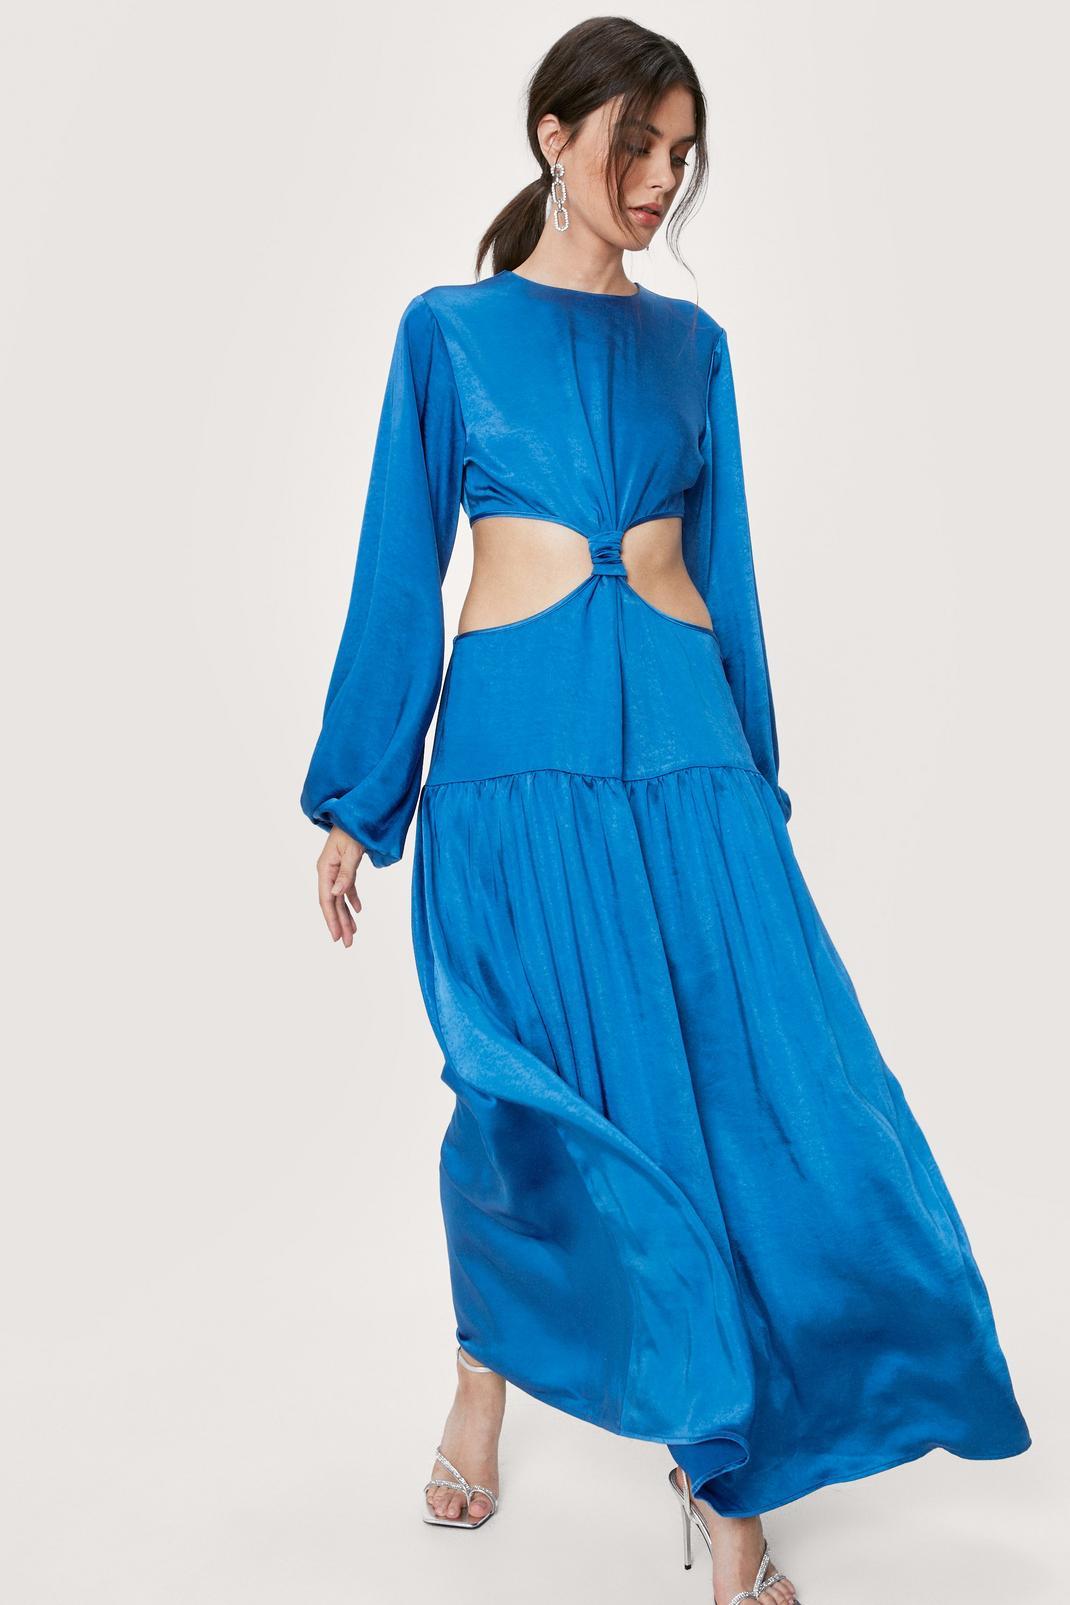 Satin High Neck Cut Out Maxi Dress